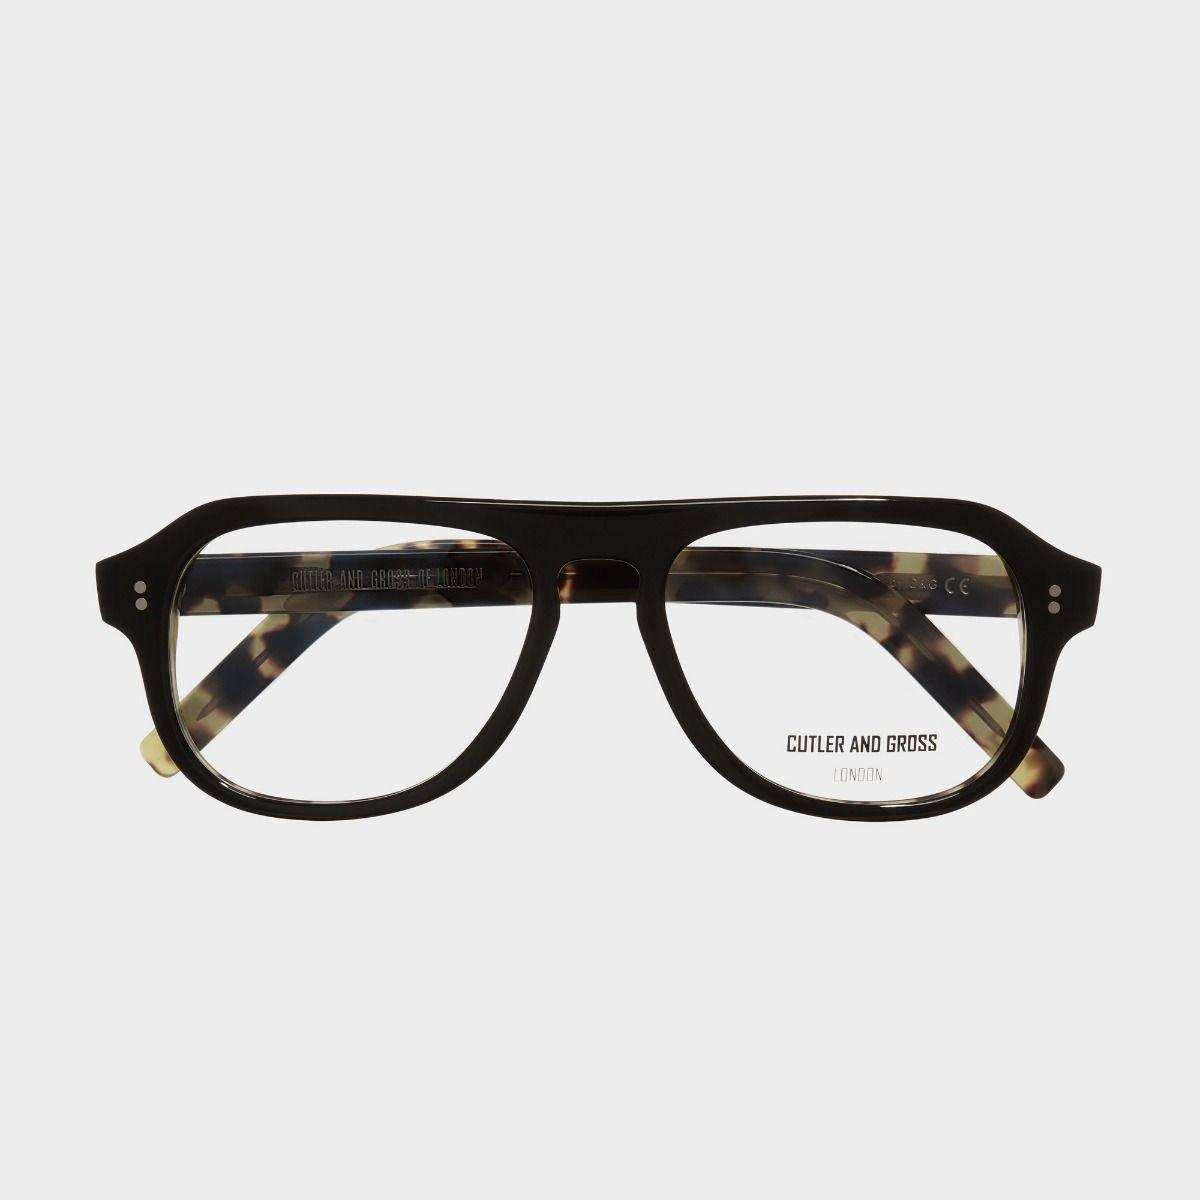 0822V3 Optical Aviator Glasses (Large)-Black on Camo